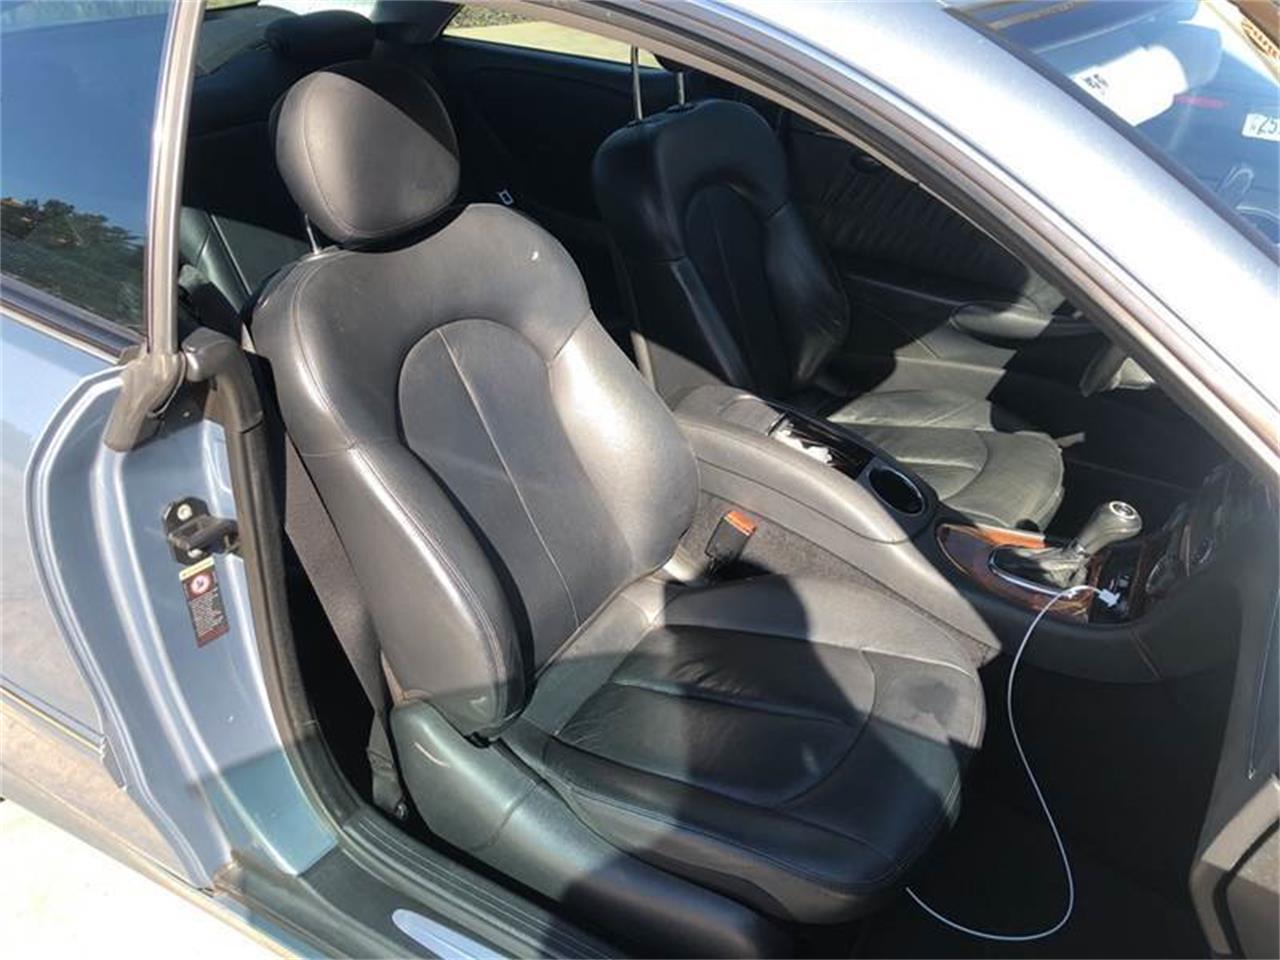 2007 Mercedes-Benz CLK (CC-1274657) for sale in Brea, California